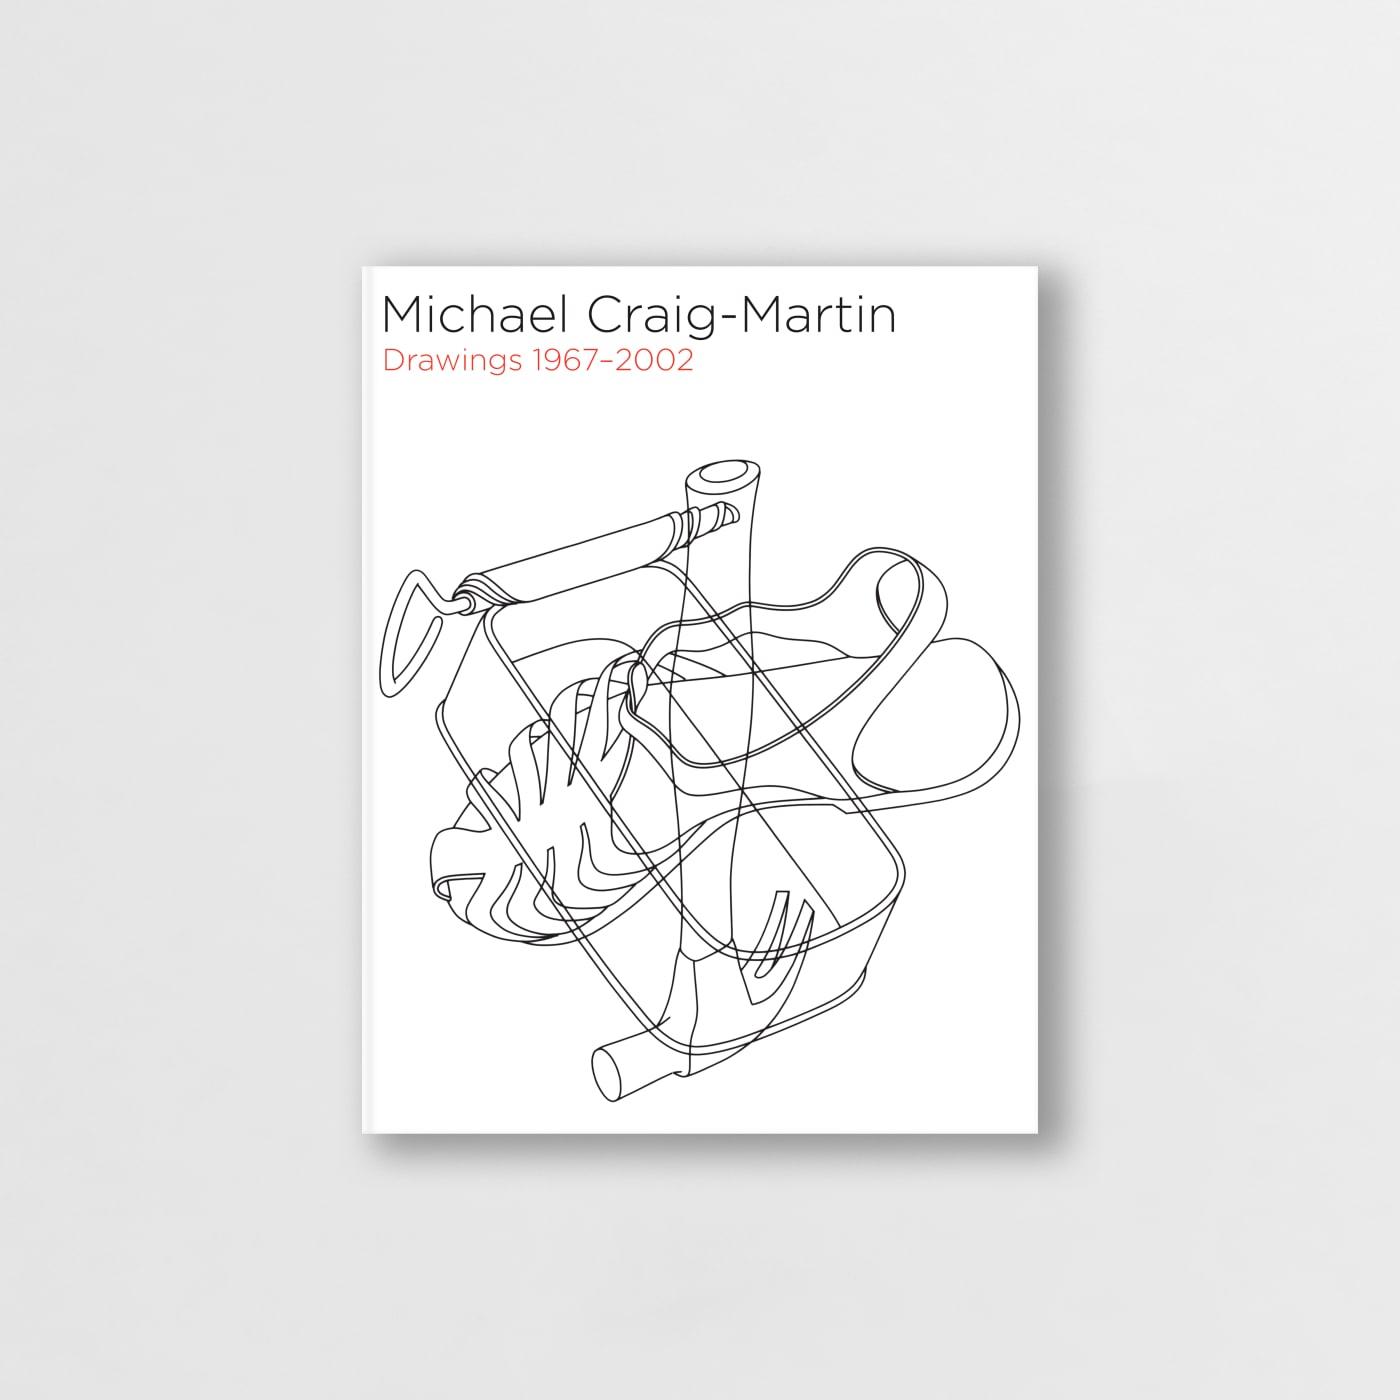 Michael Craig-Martin. Drawings 1967-2002